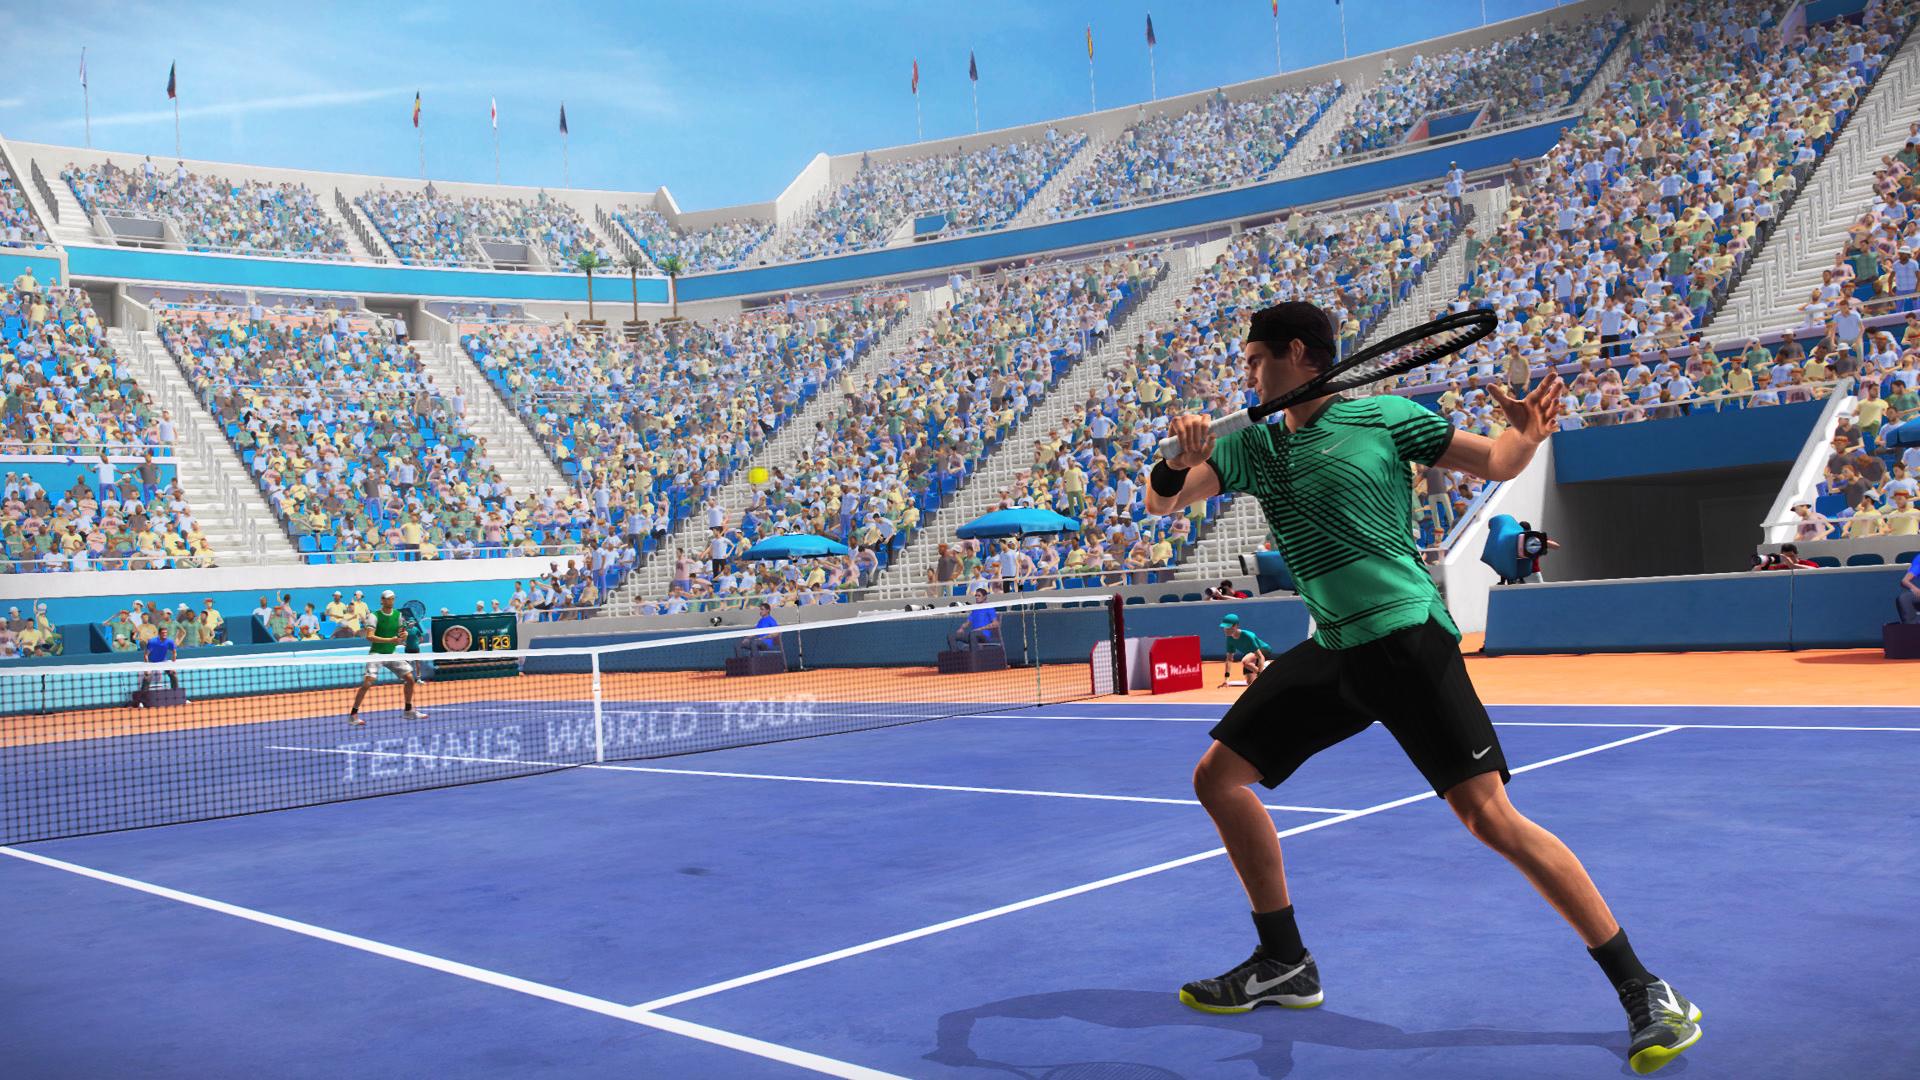 Tennis World Tour Análise - Gamereactor 91a58c4e18814